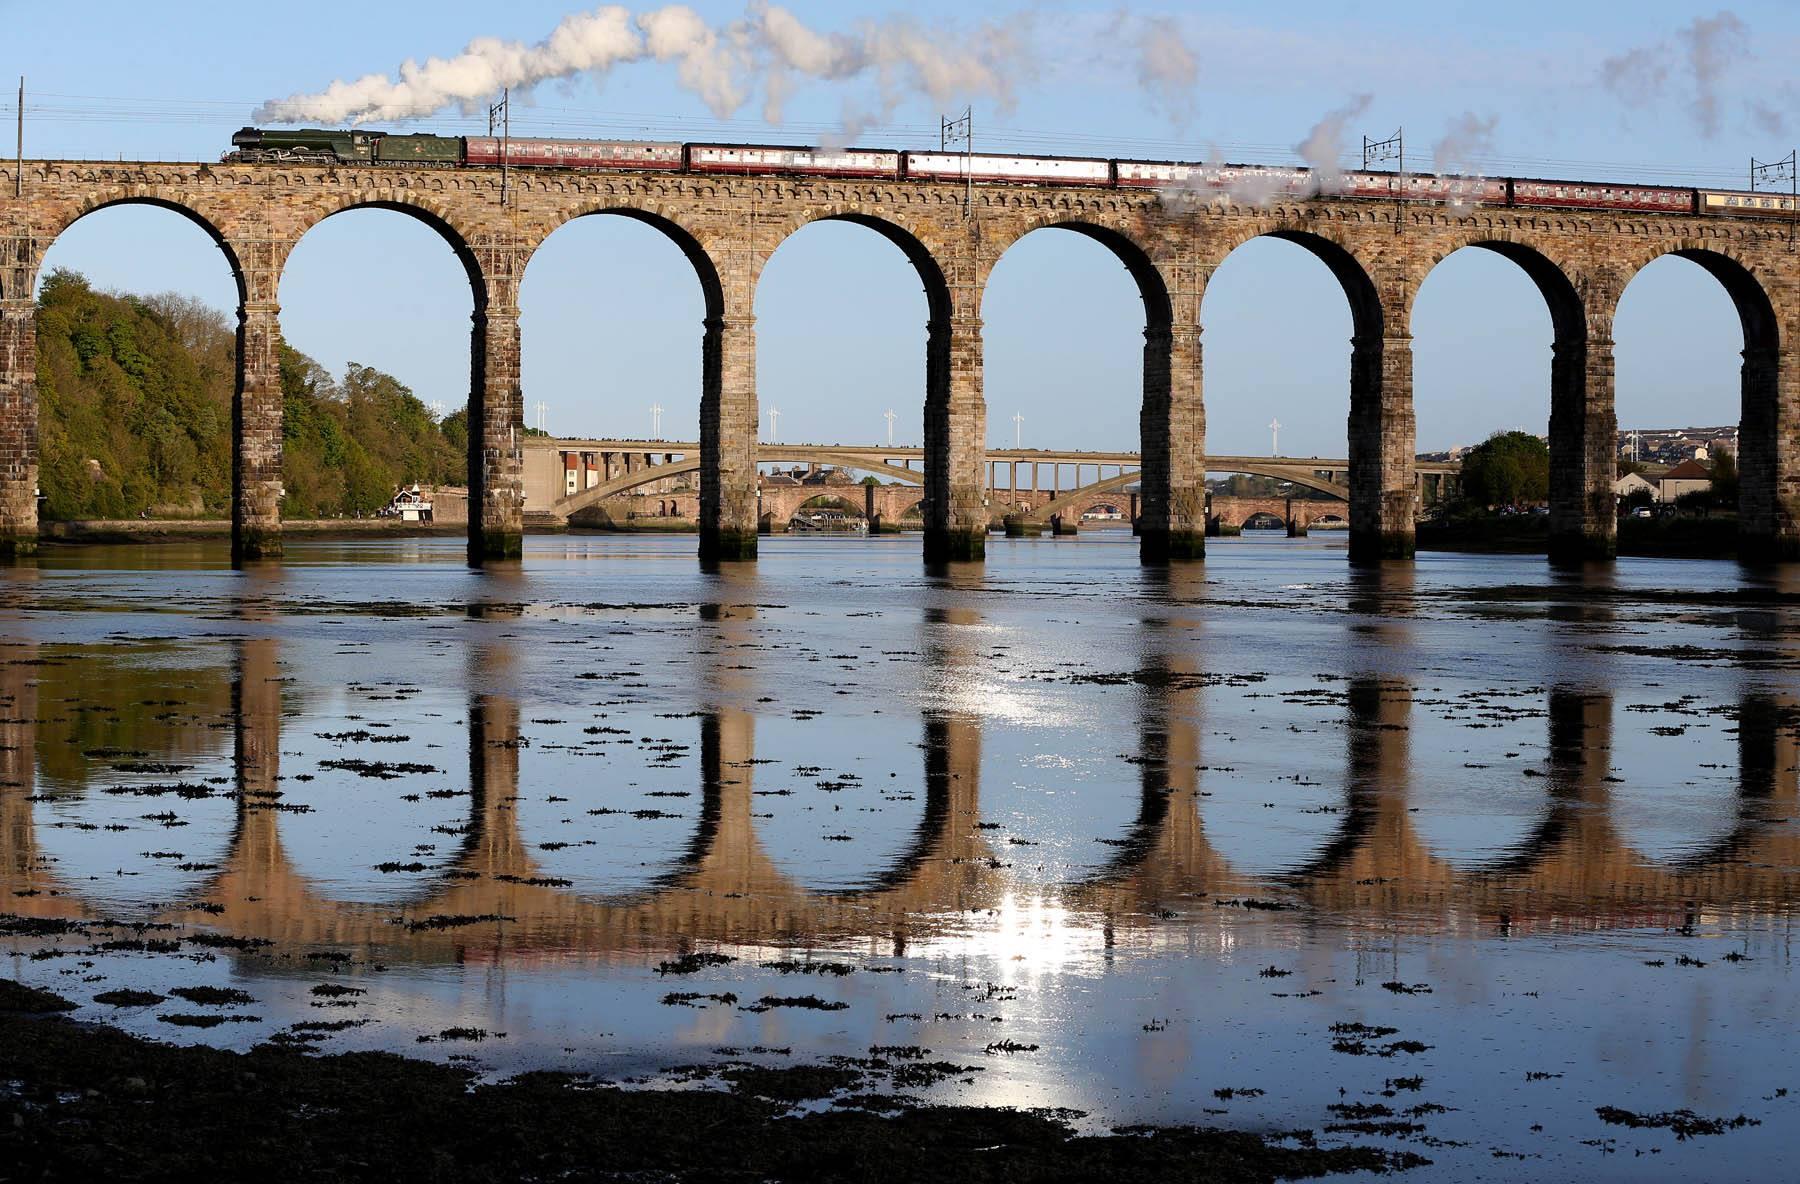 Flying Scotsman and Royal Border Bridge, Berwick upon Tweed. Photo: Chris Booth